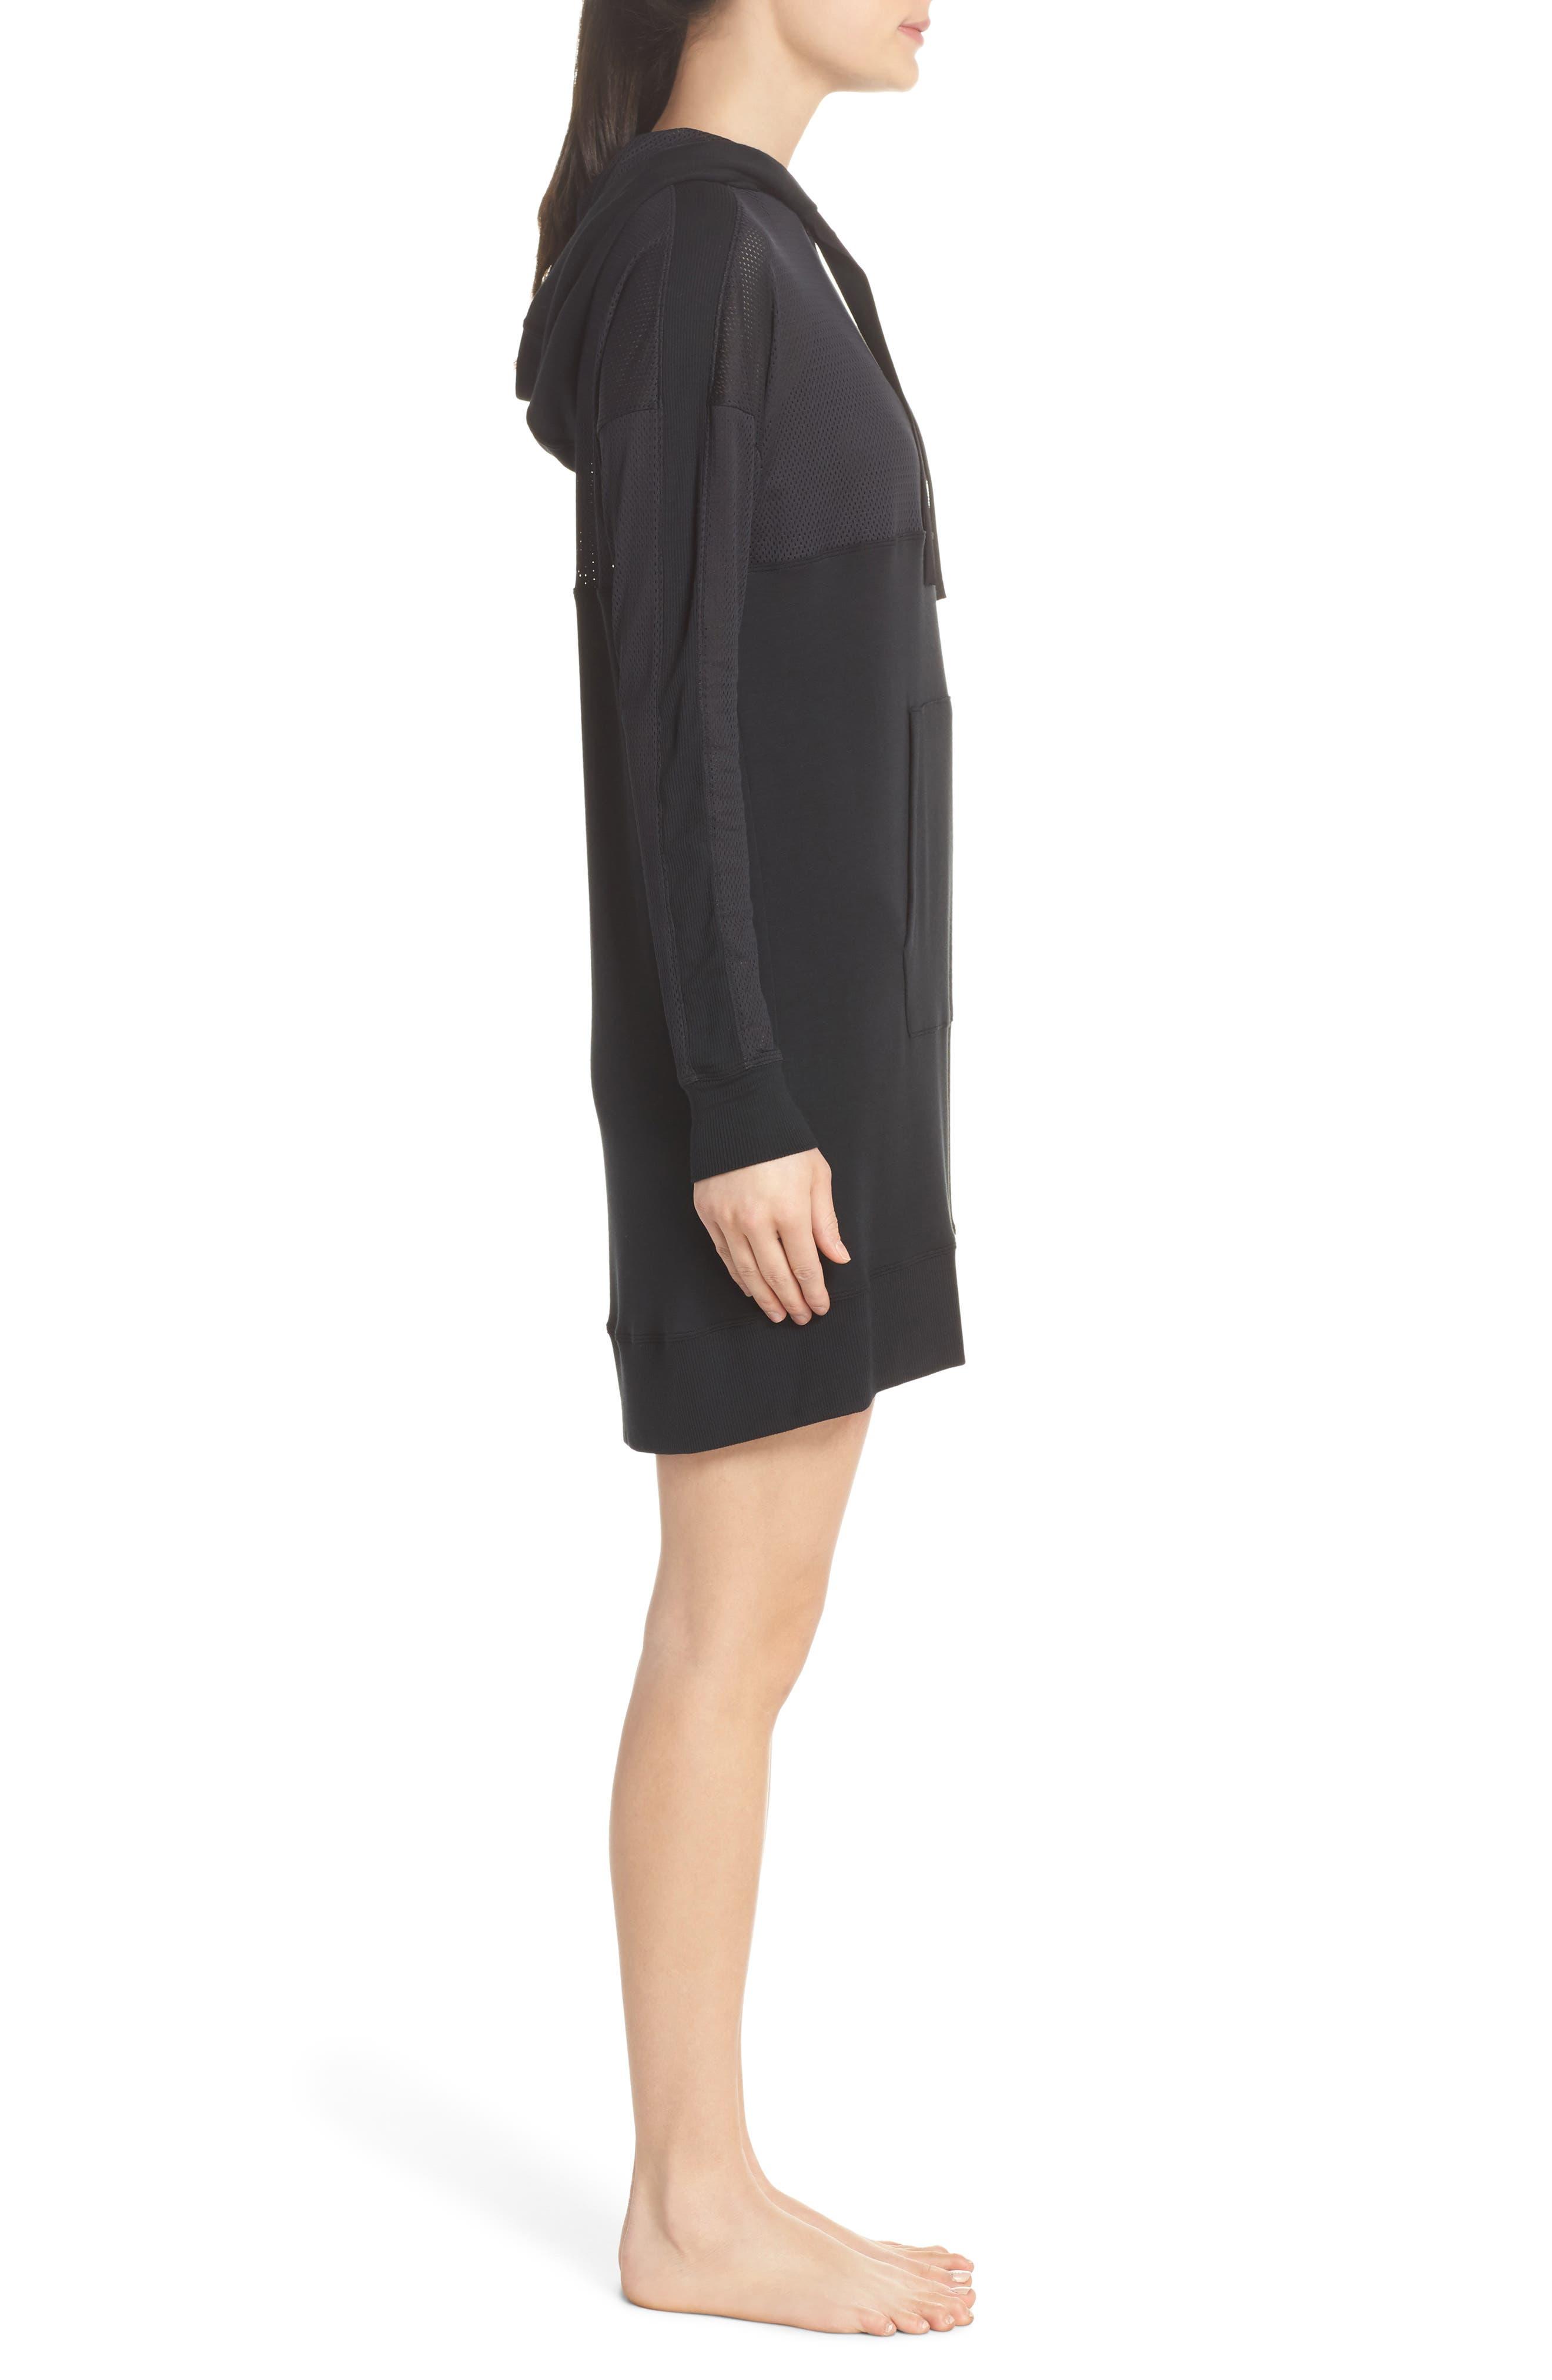 Range Dress,                             Alternate thumbnail 3, color,                             Black